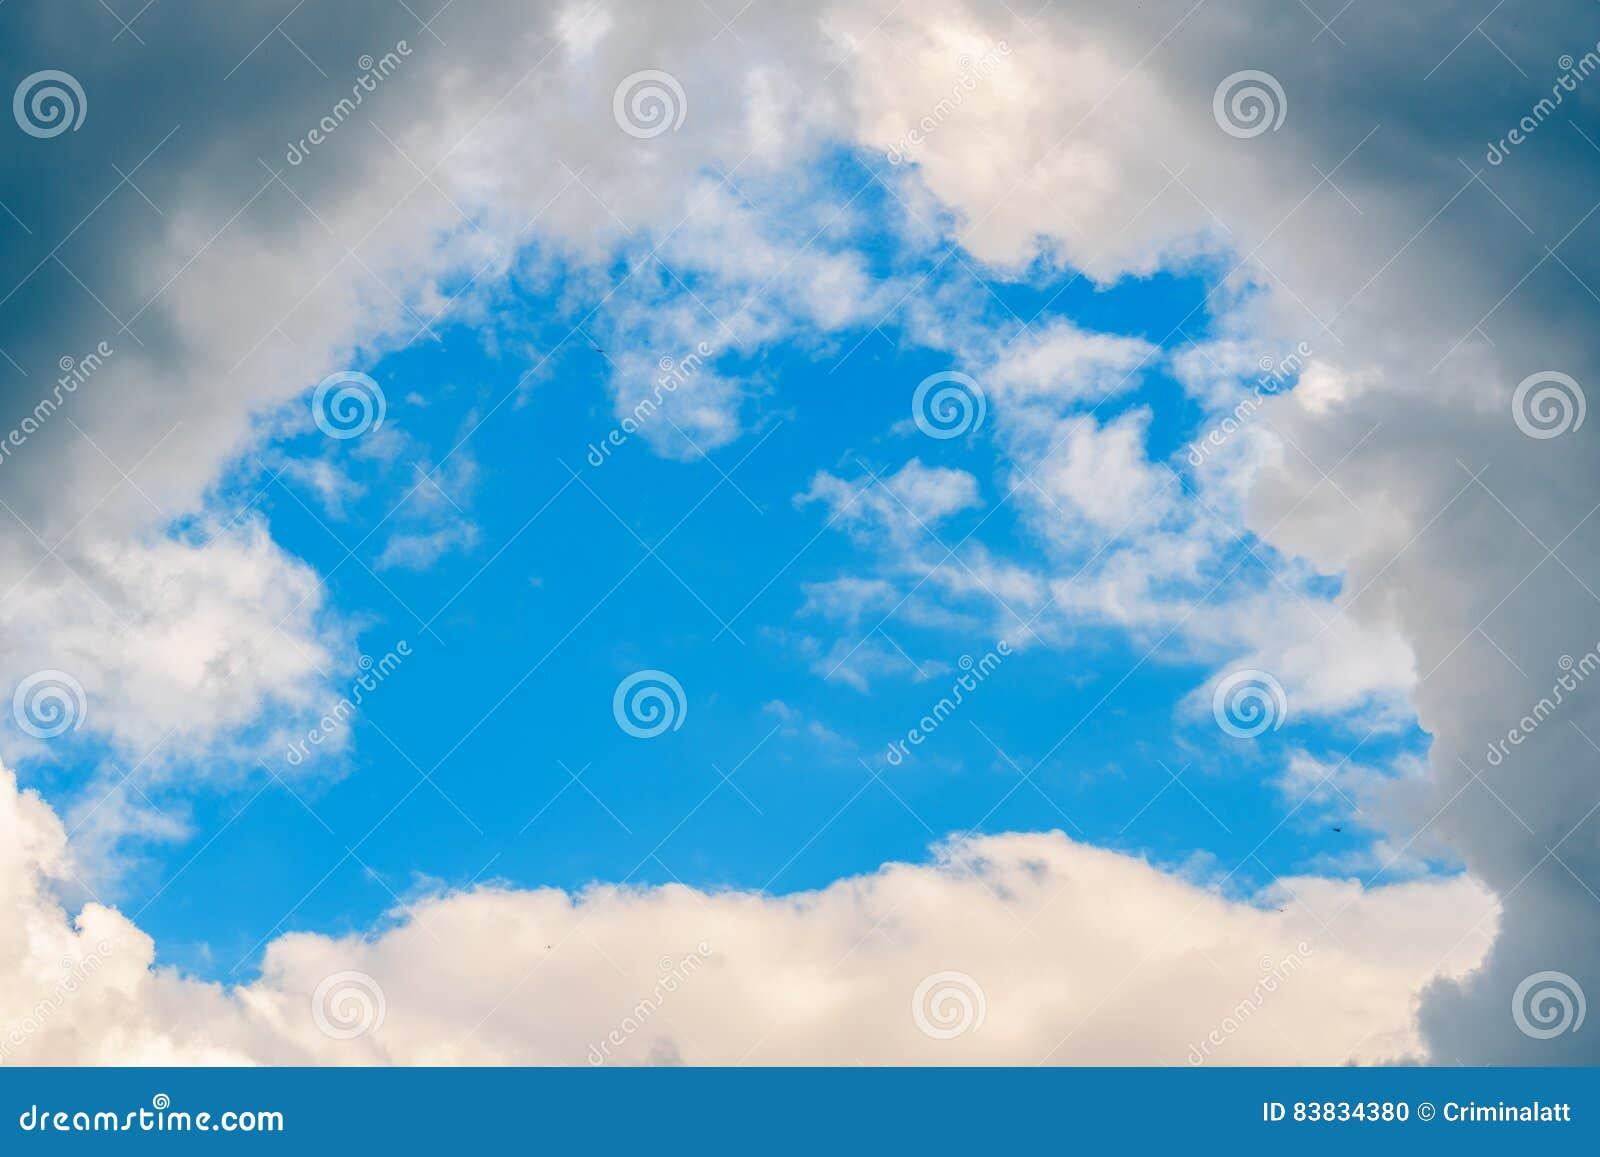 natural frame cloud